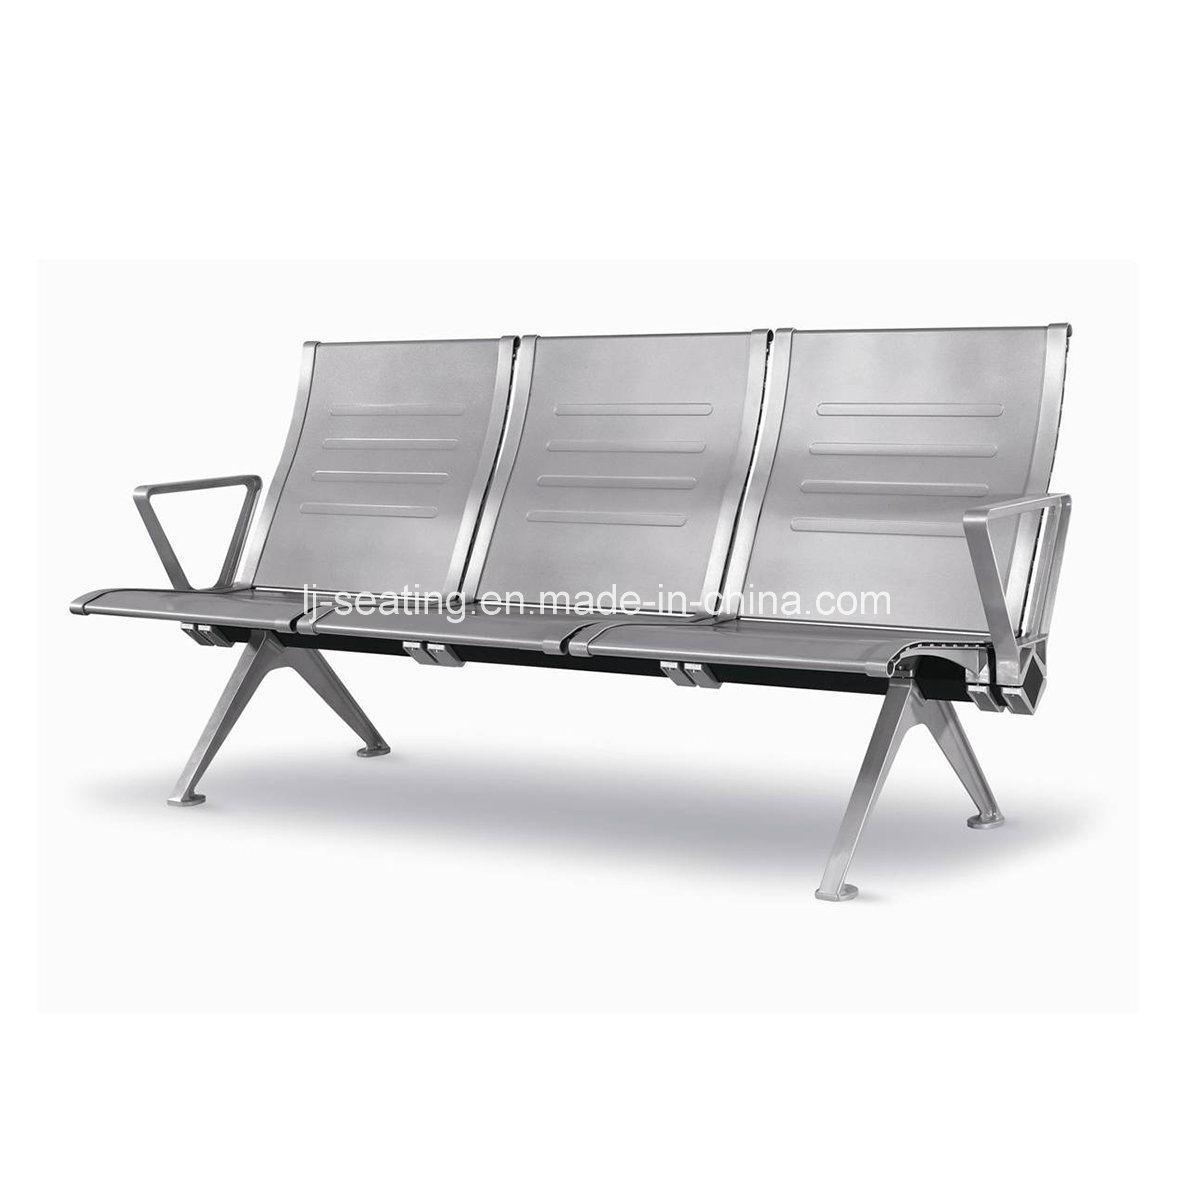 Awe Inspiring Airport Bench Seating 3 Seater Waiting Chair Ls 530 Evergreenethics Interior Chair Design Evergreenethicsorg